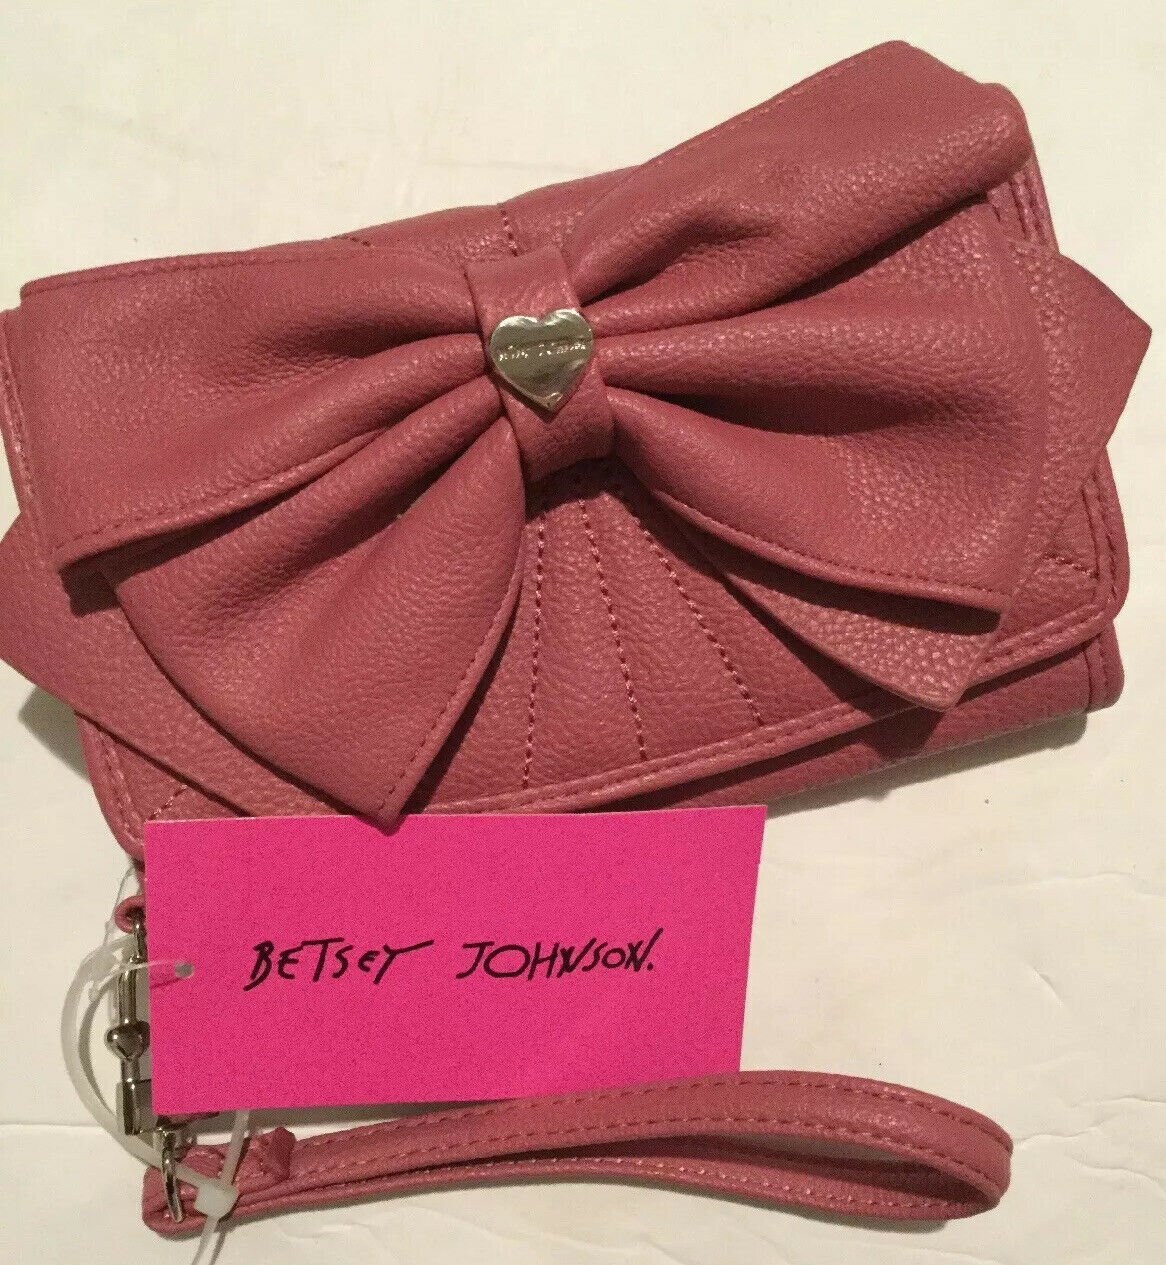 Betsey Johnson Womens Pink Flap Bow Checkbook Wallet Wristlet Silver BBS0165